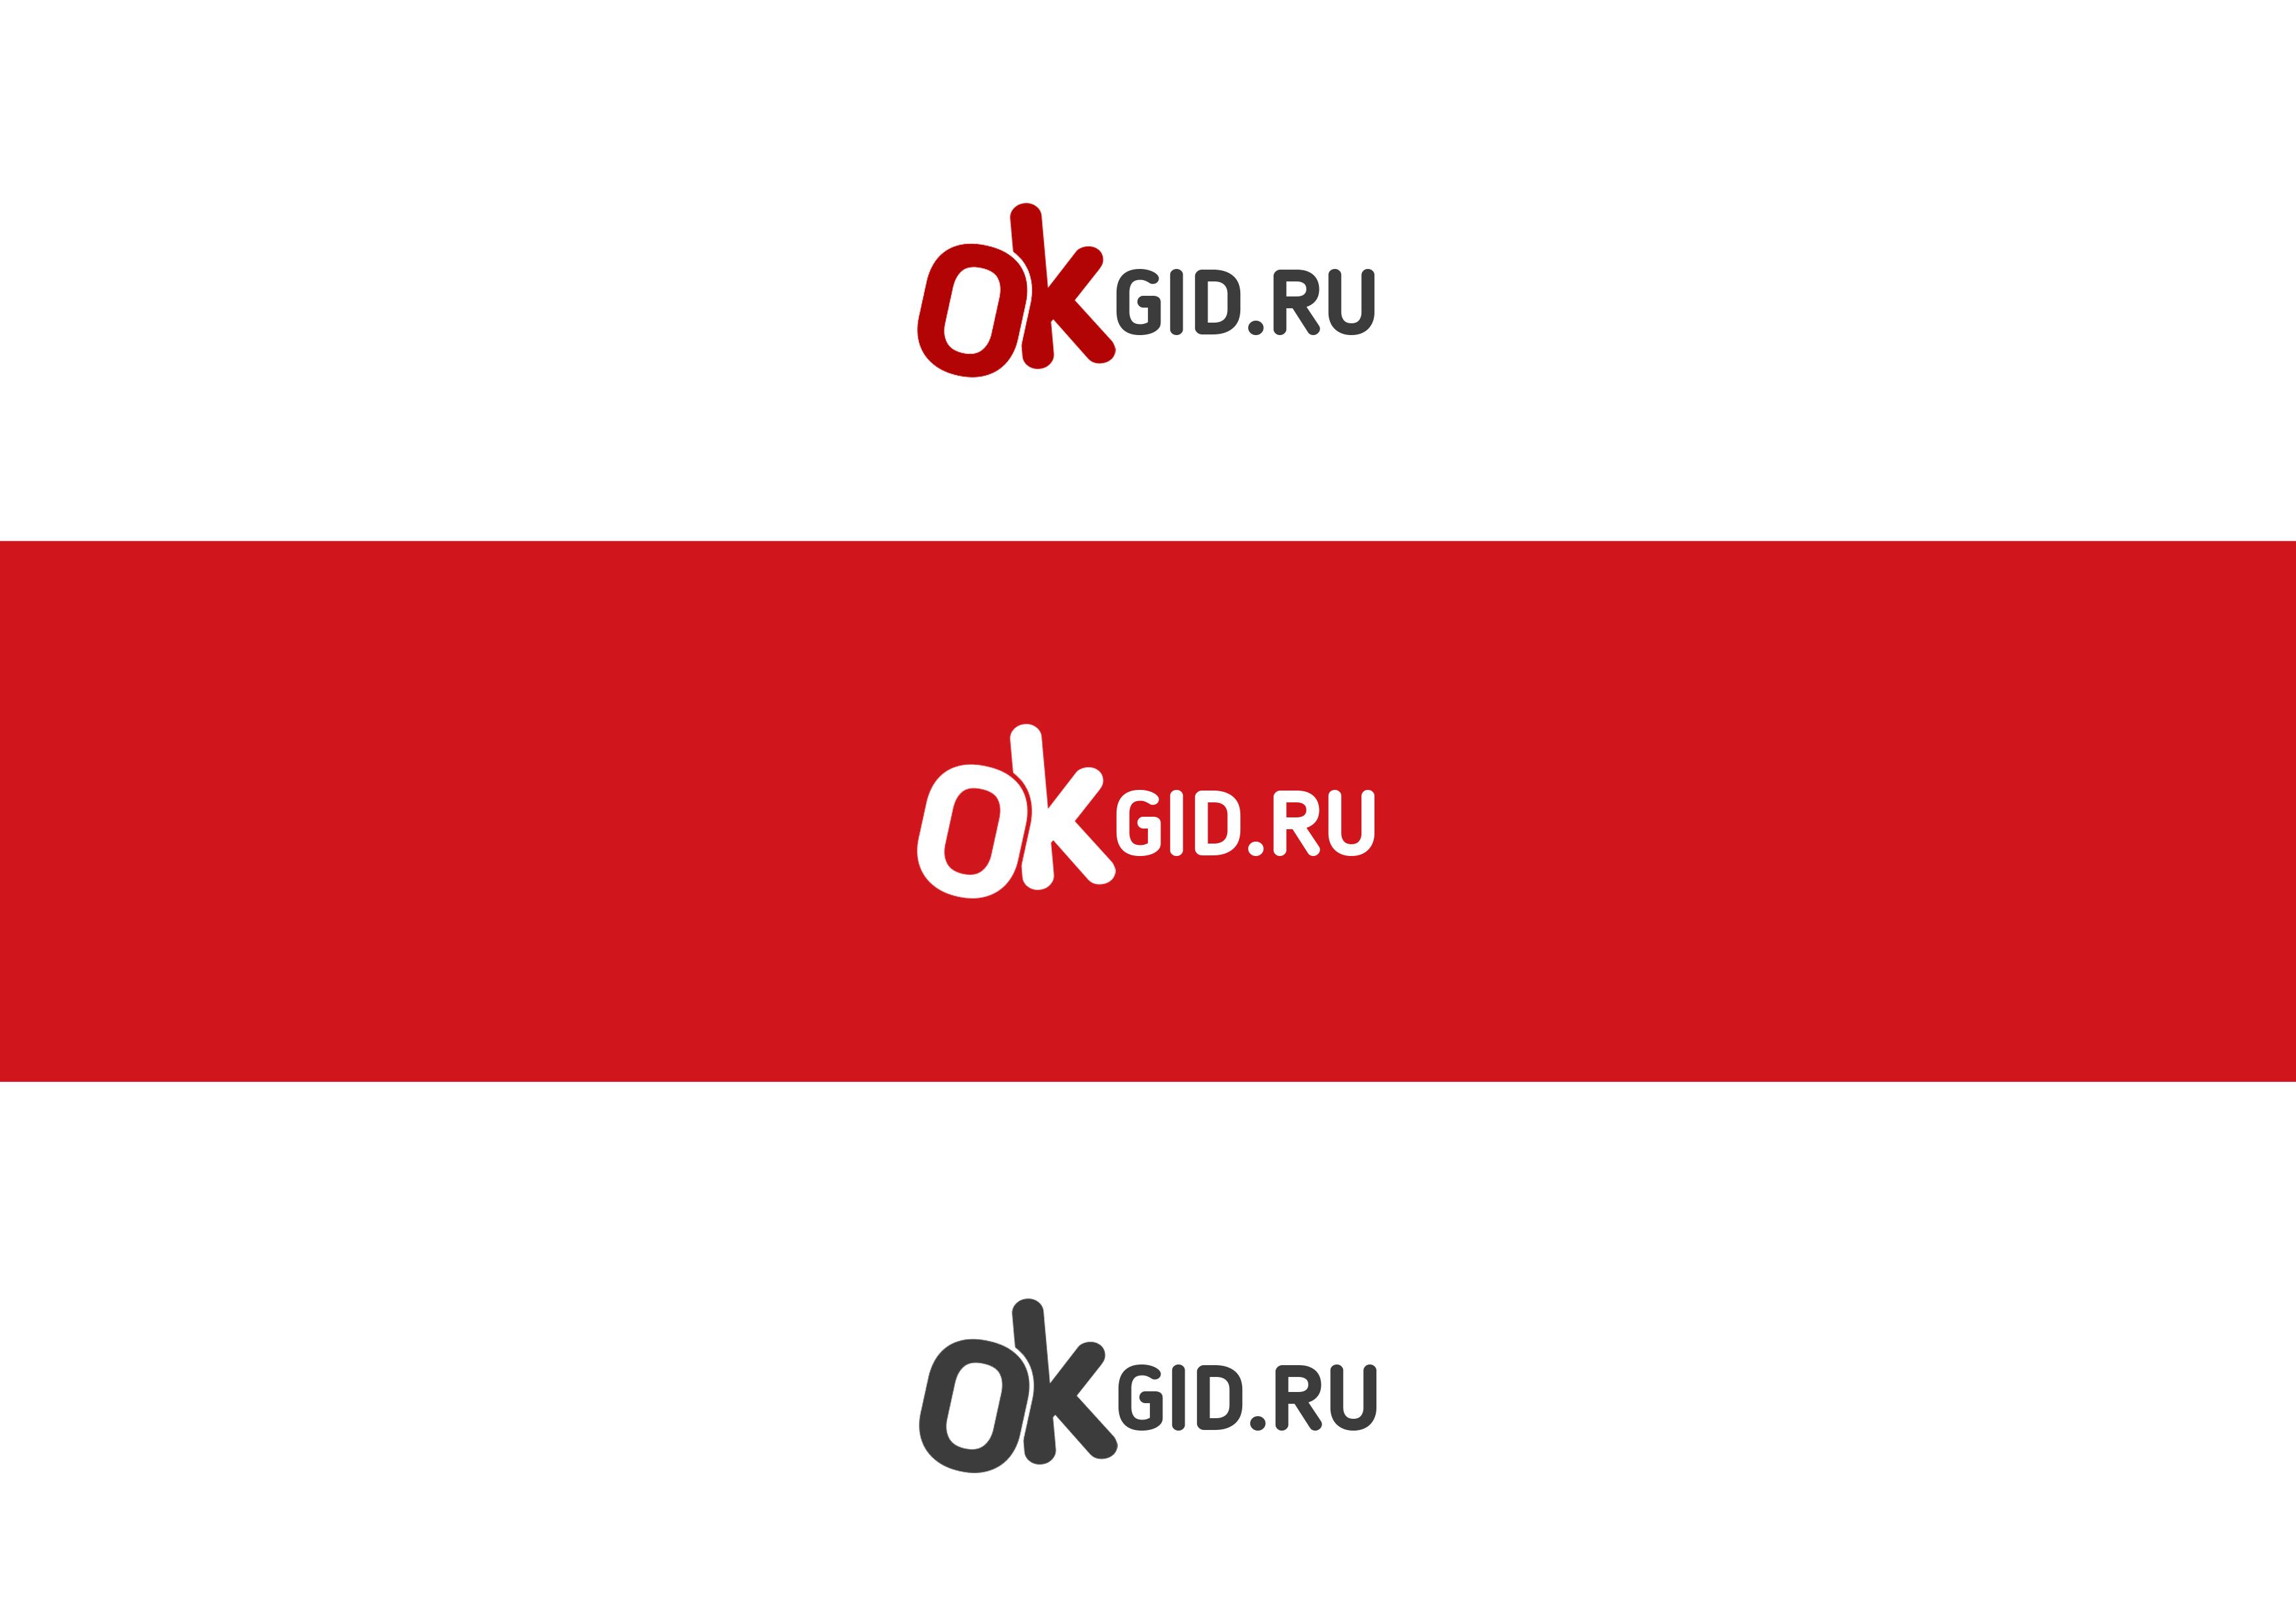 Логотип для сайта OKgid.ru фото f_16657c2d9816e891.jpg